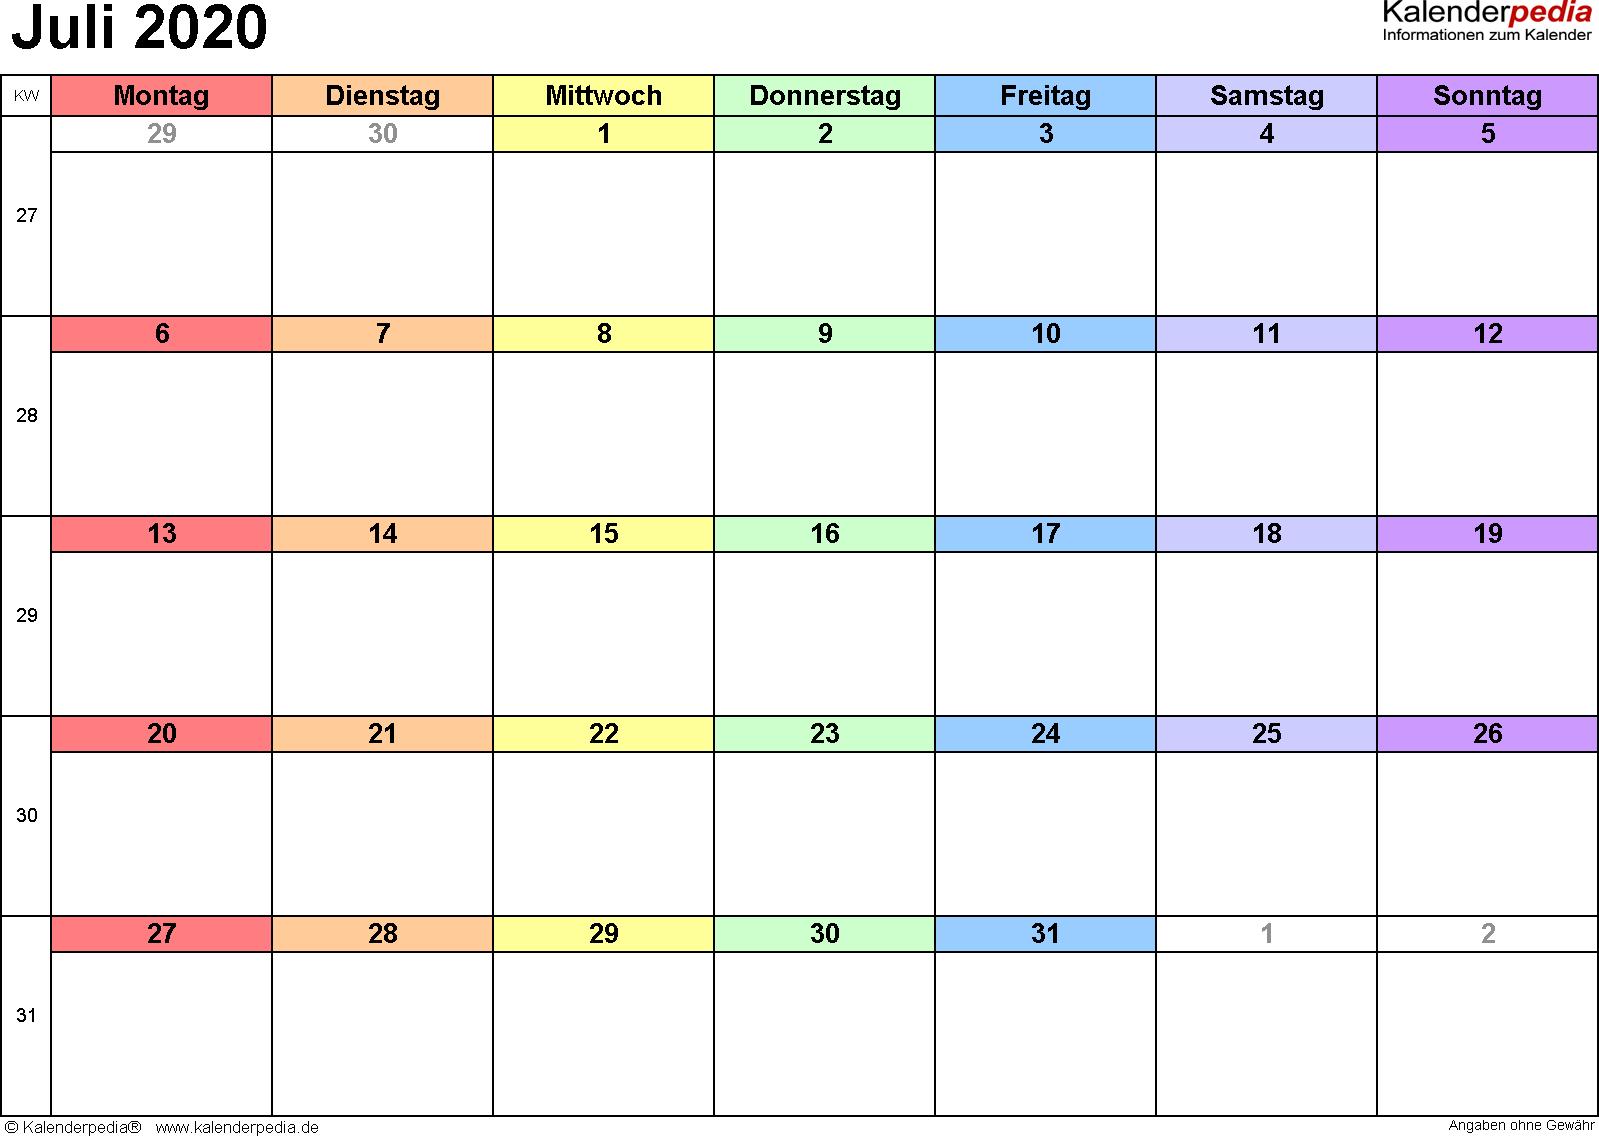 Kalender Juli 2020 (Querformat) als Excel-Vorlage